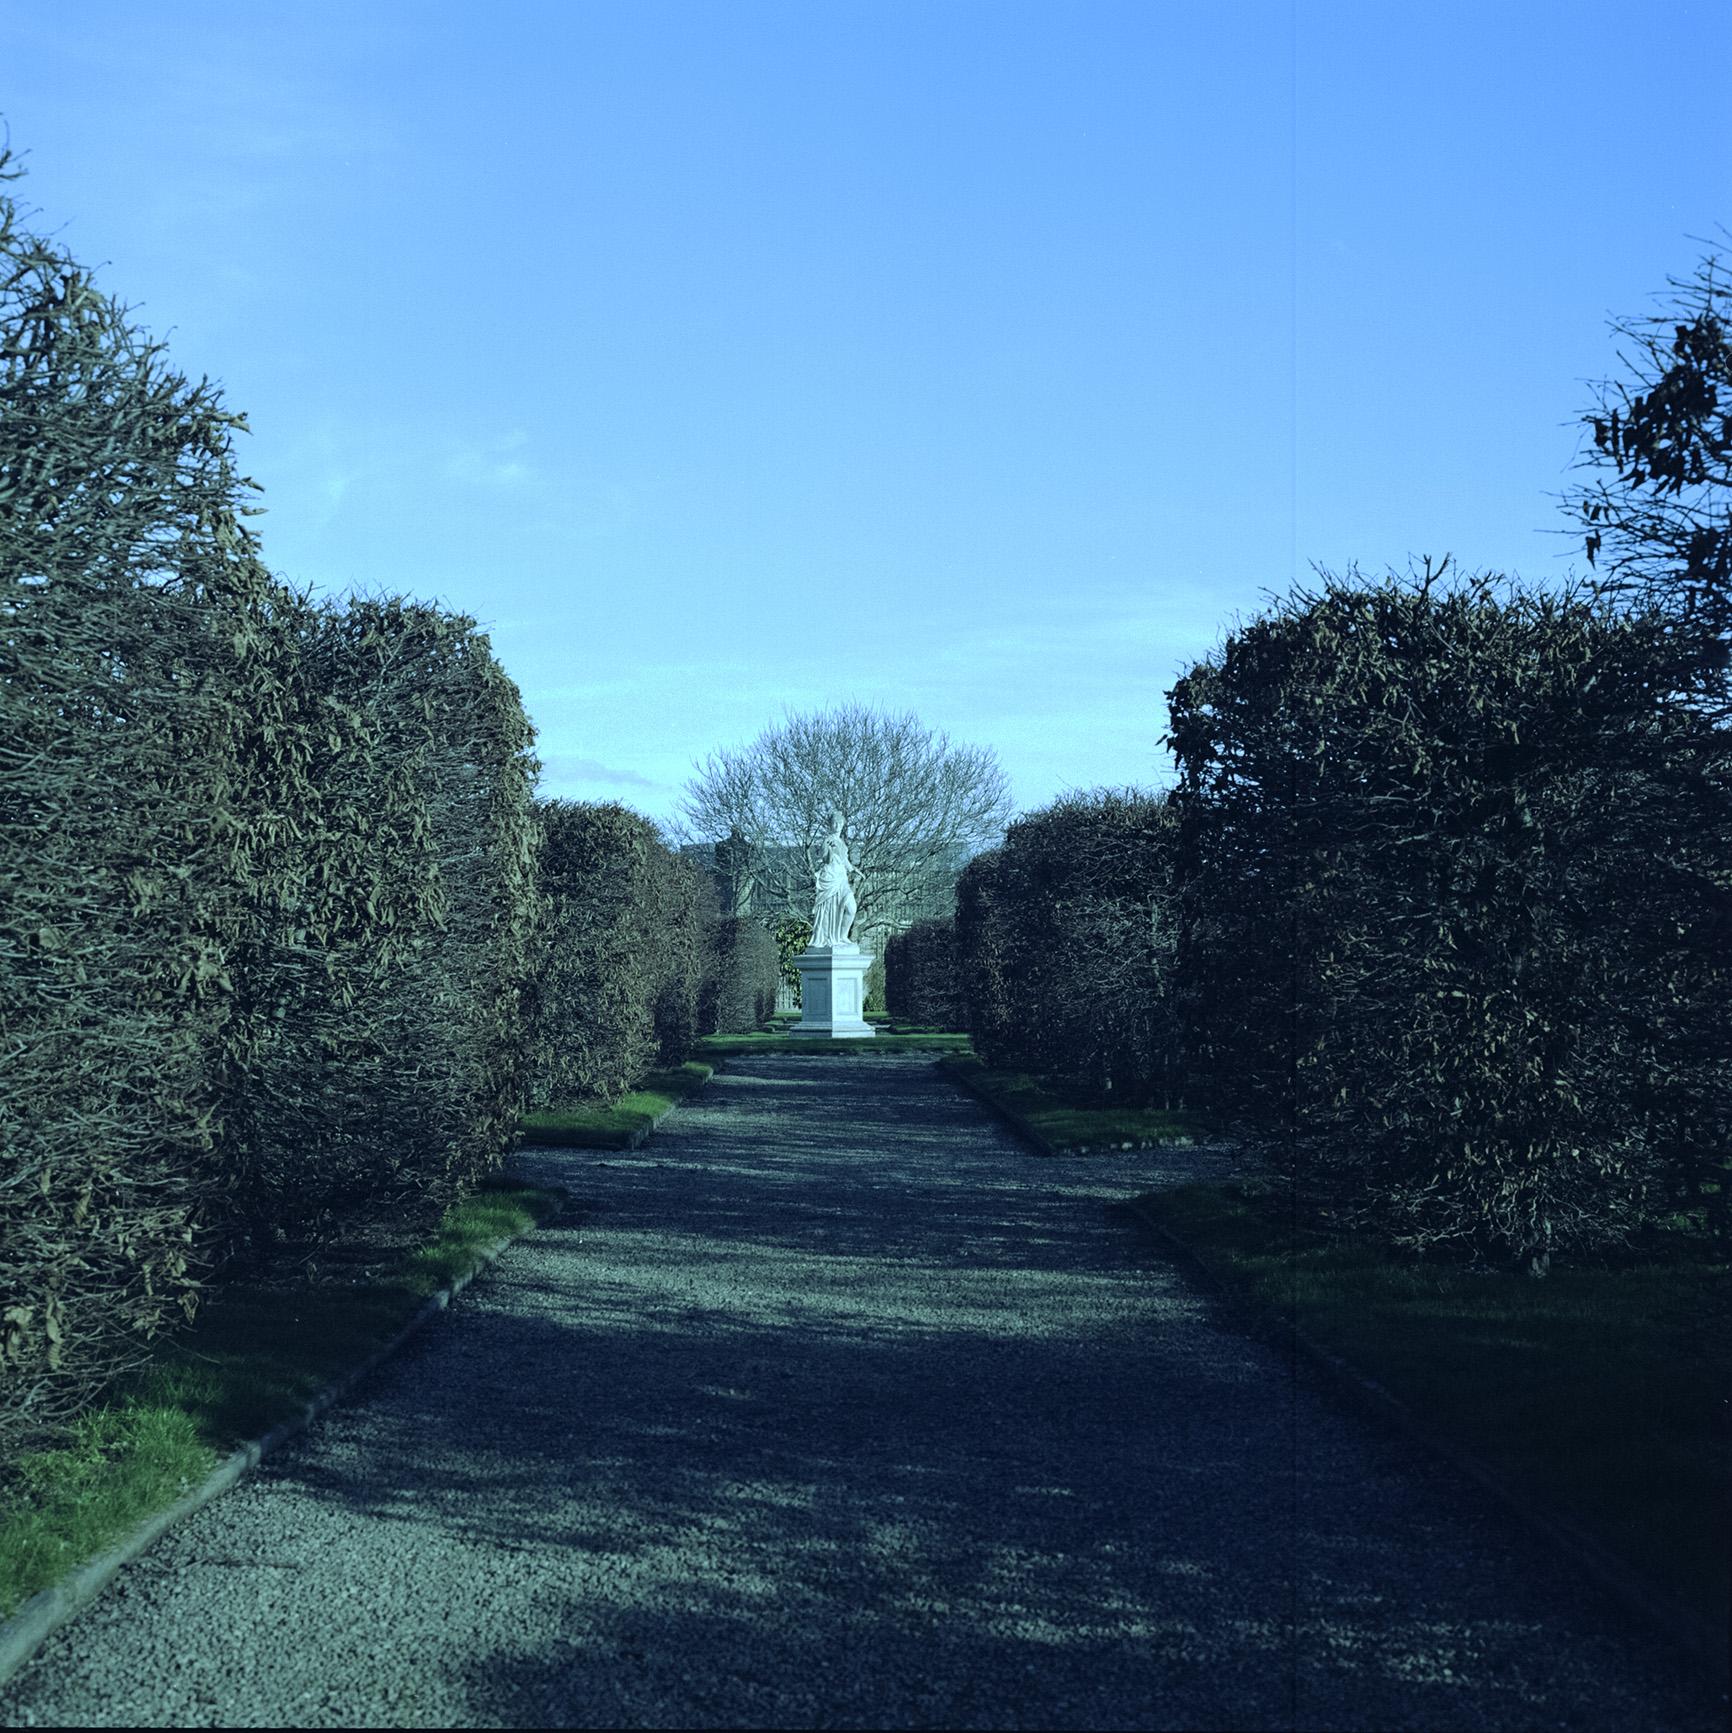 IMMA_Formal_Gardens_4.jpg